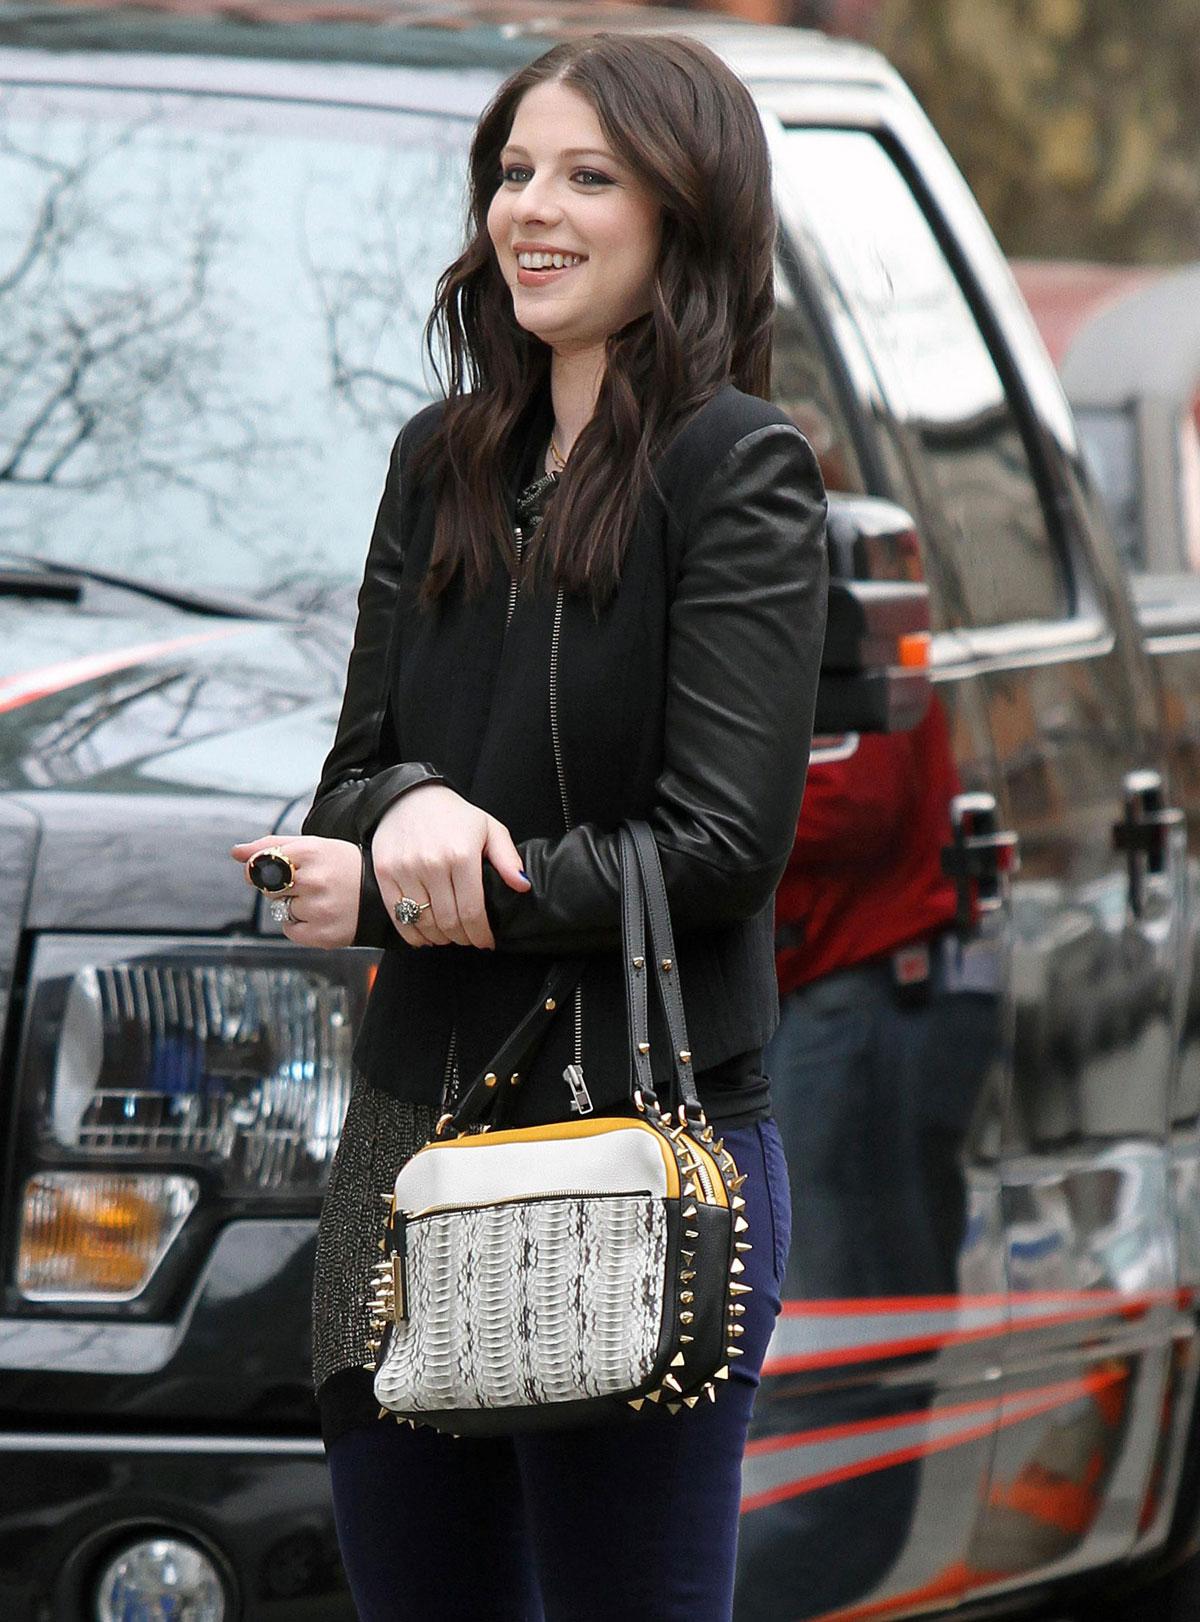 michelle trachtenberg on the gossip girl set in new york